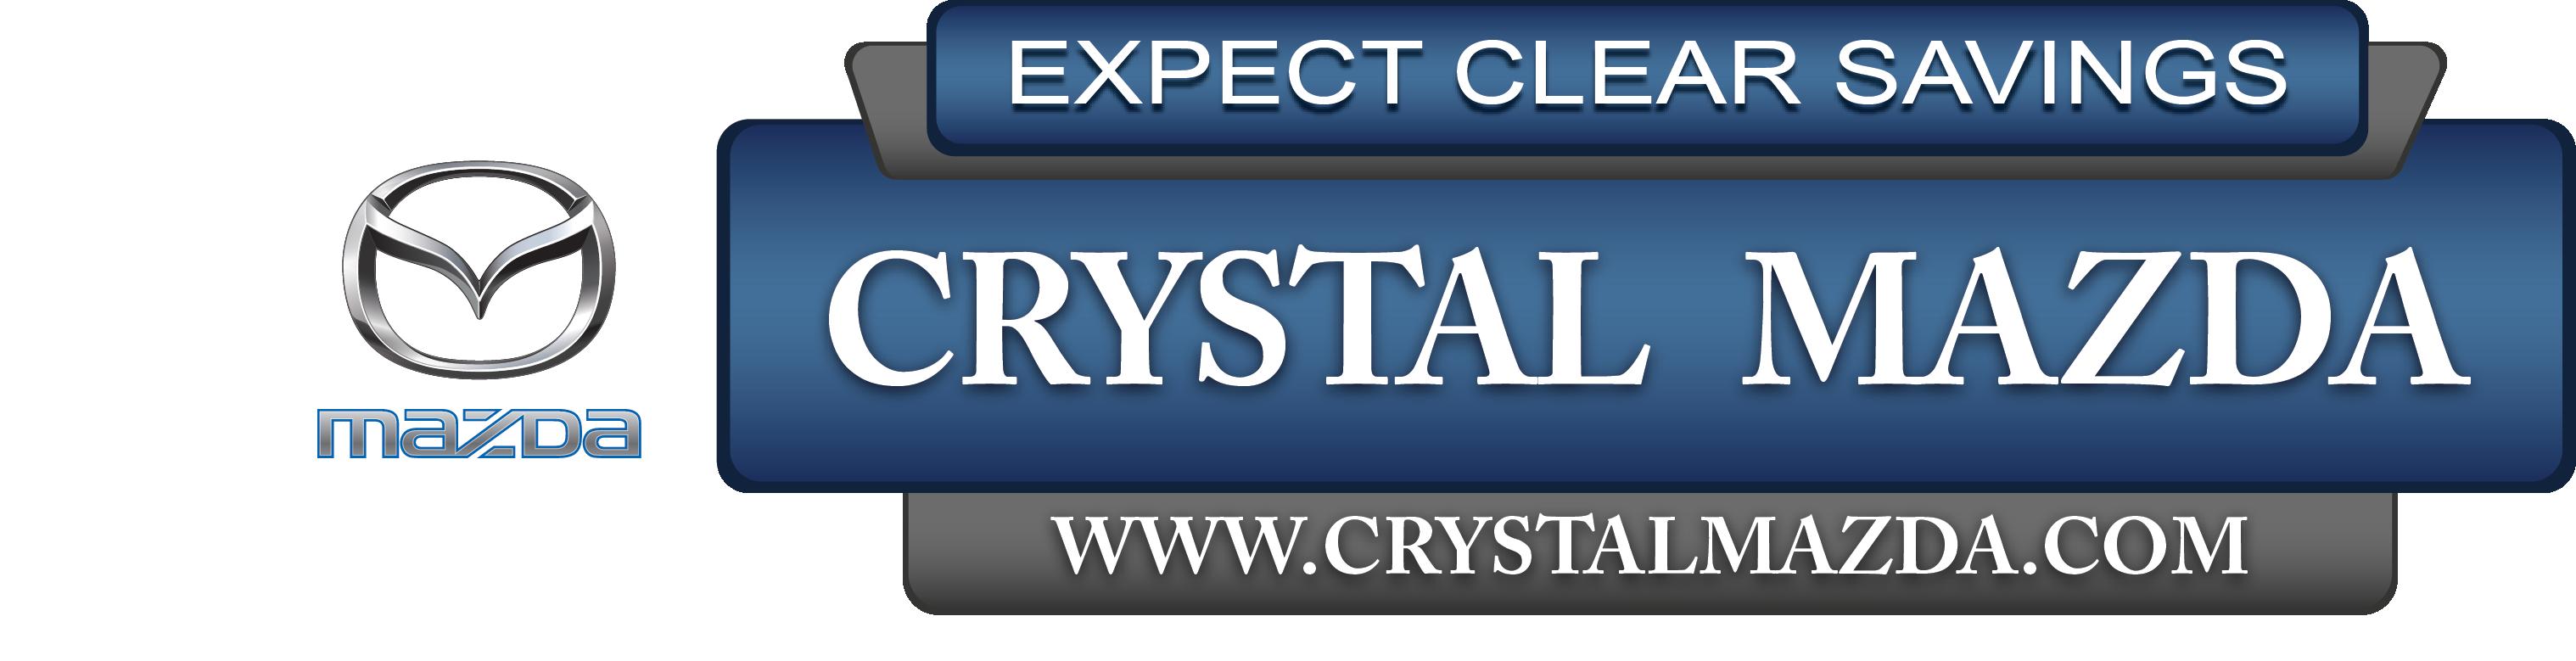 Fidelity Warranty Services Review >> Crystal Mazda | Green Brook Mazda Car Dealers | East Brunswick, Avenel, Union